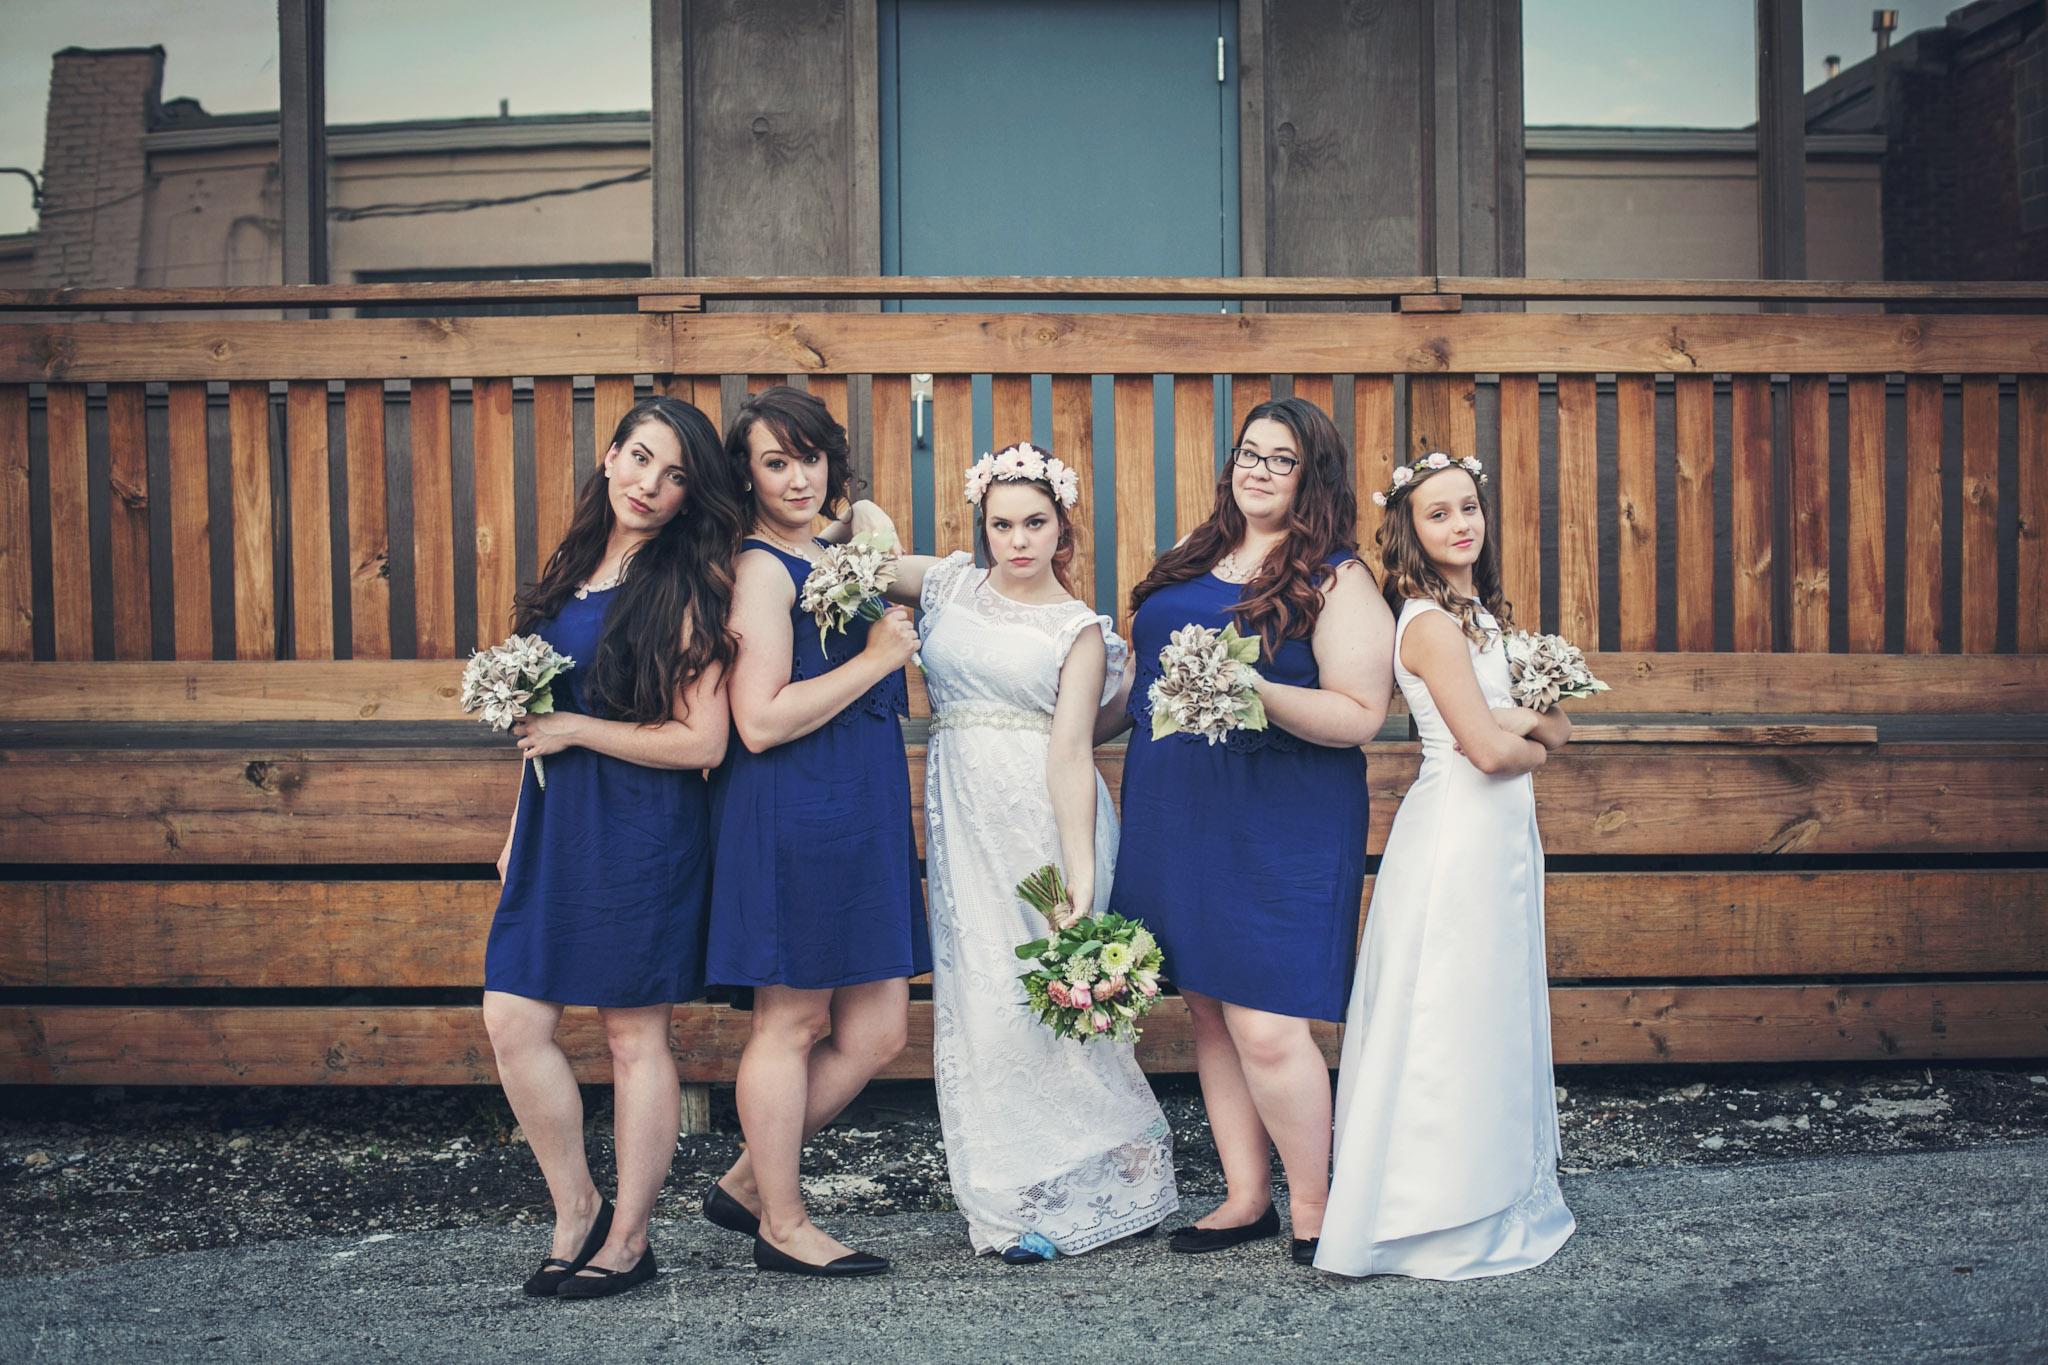 Kansas_City_Small_Wedding_Venue_Elope_Intimate_Ceremony_Budget_Affordable_Sophie&Philip_219b.jpg